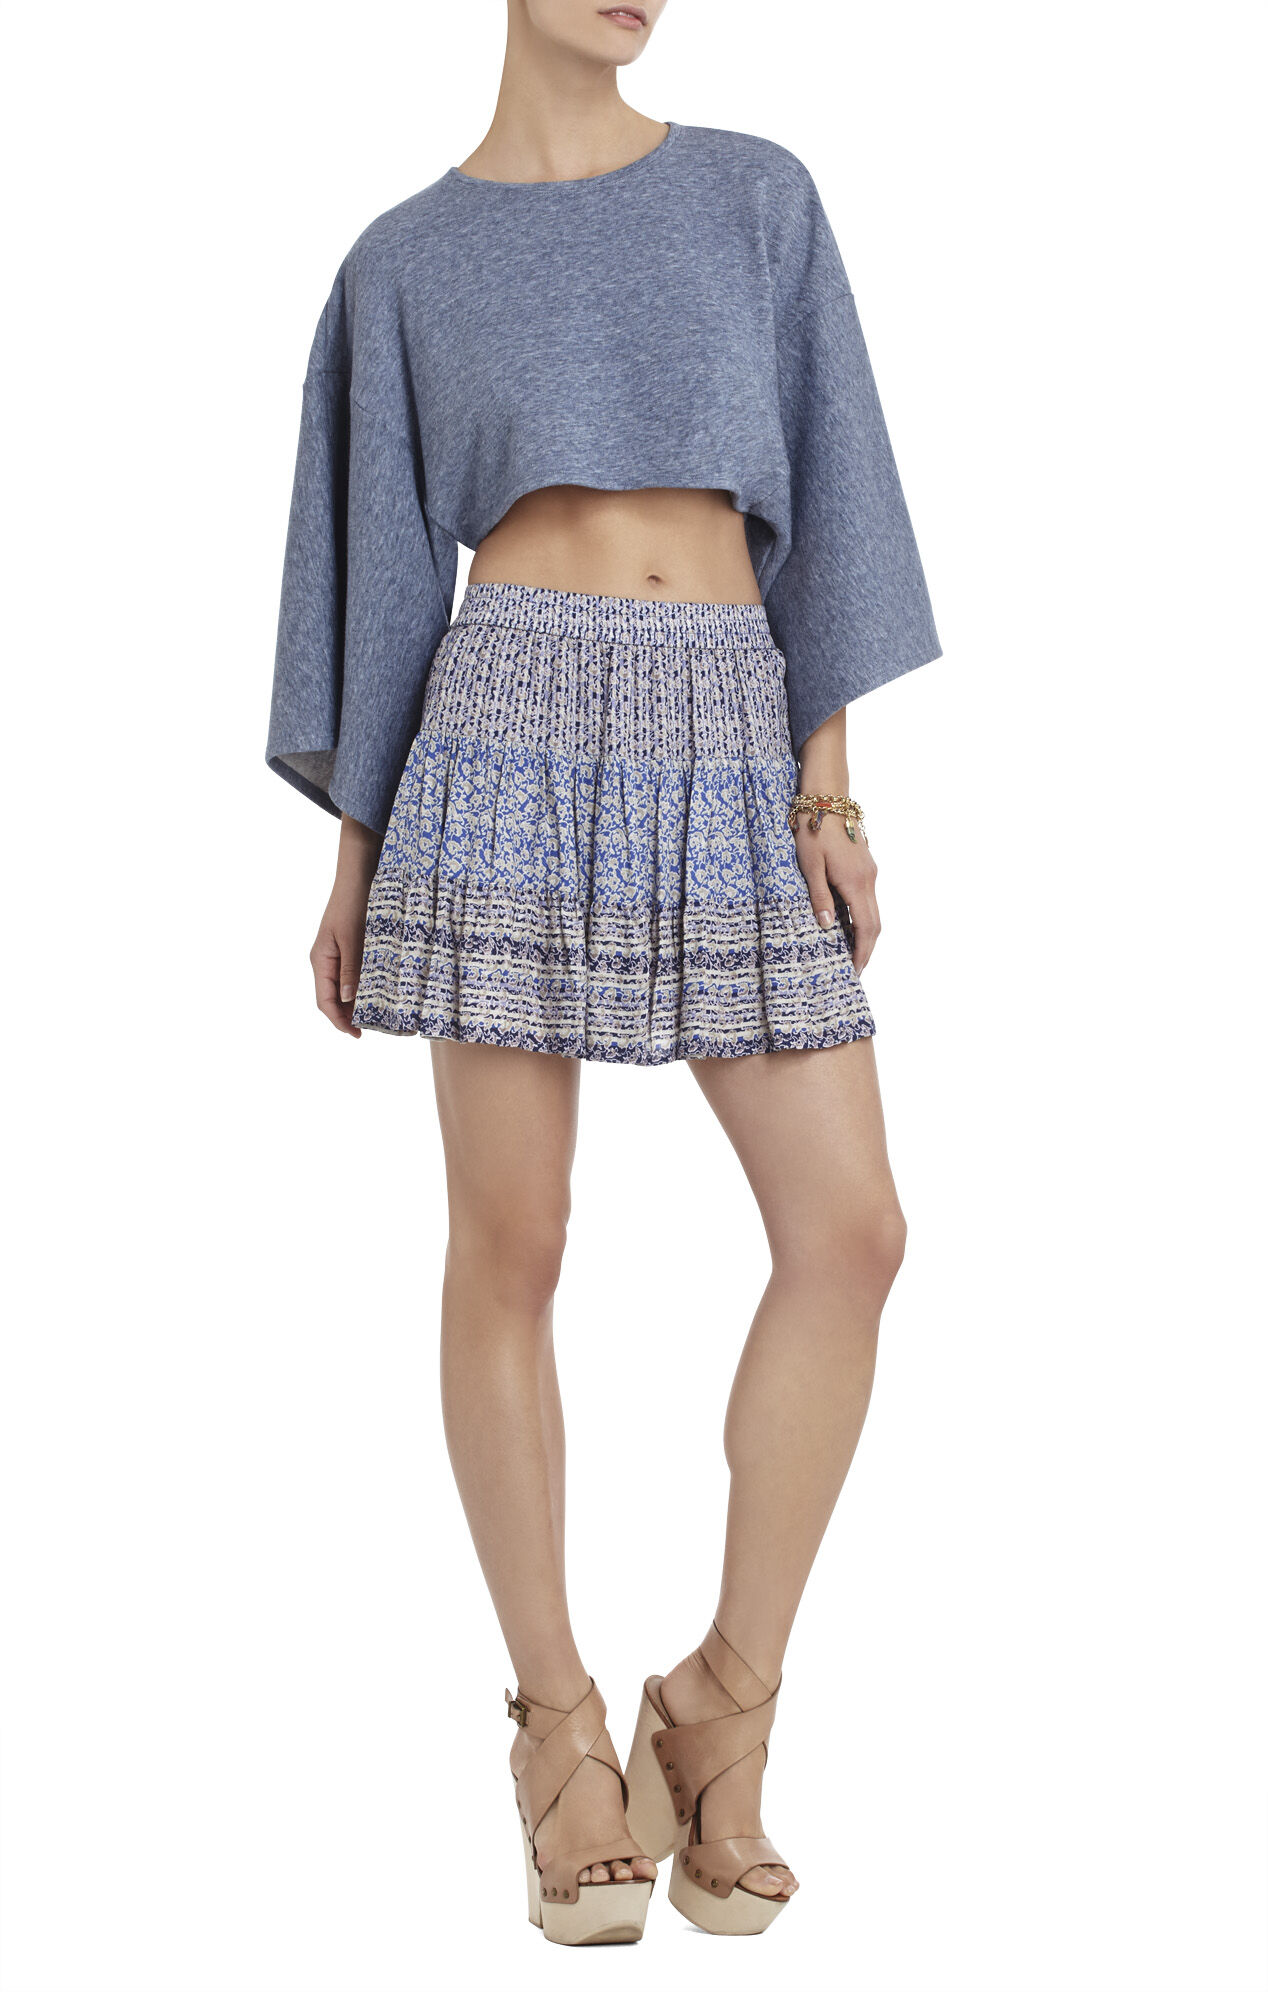 Paula Printed A-Line Skirt